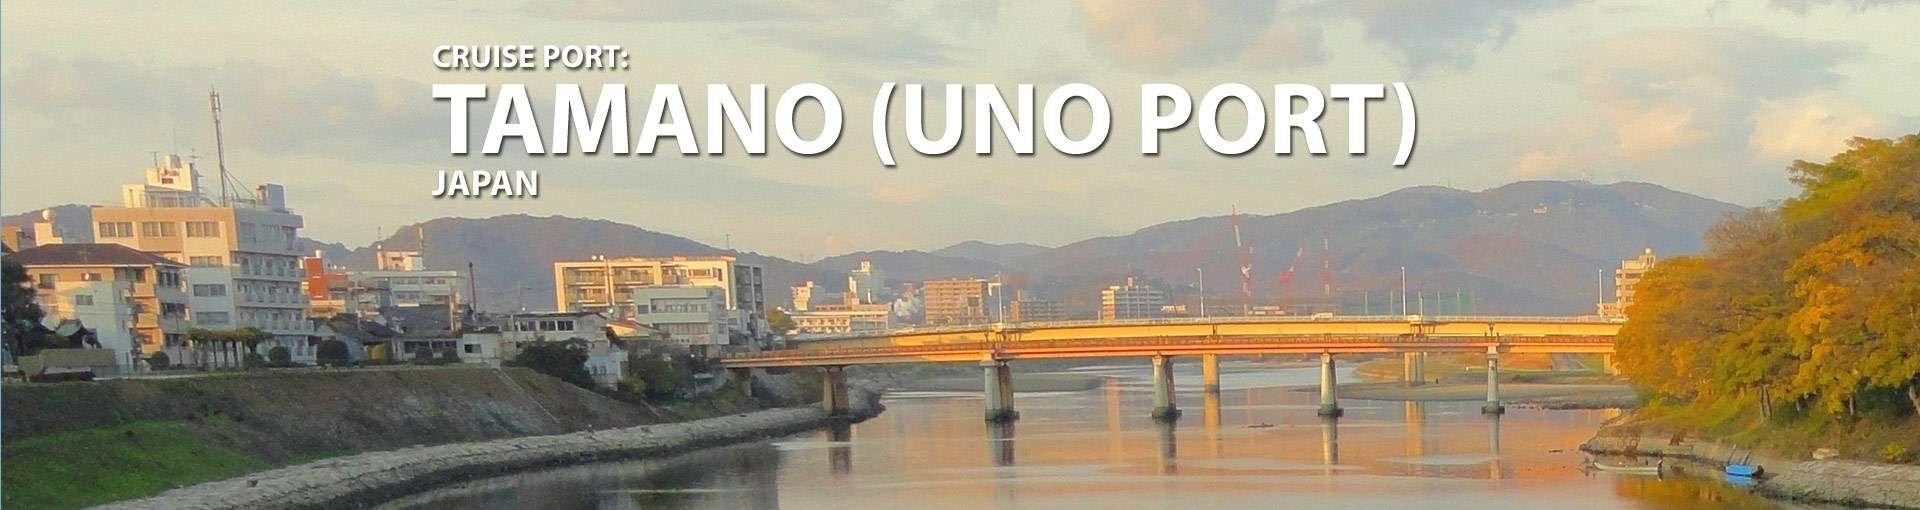 Tamano (Uno Port), Japan Cruise Port